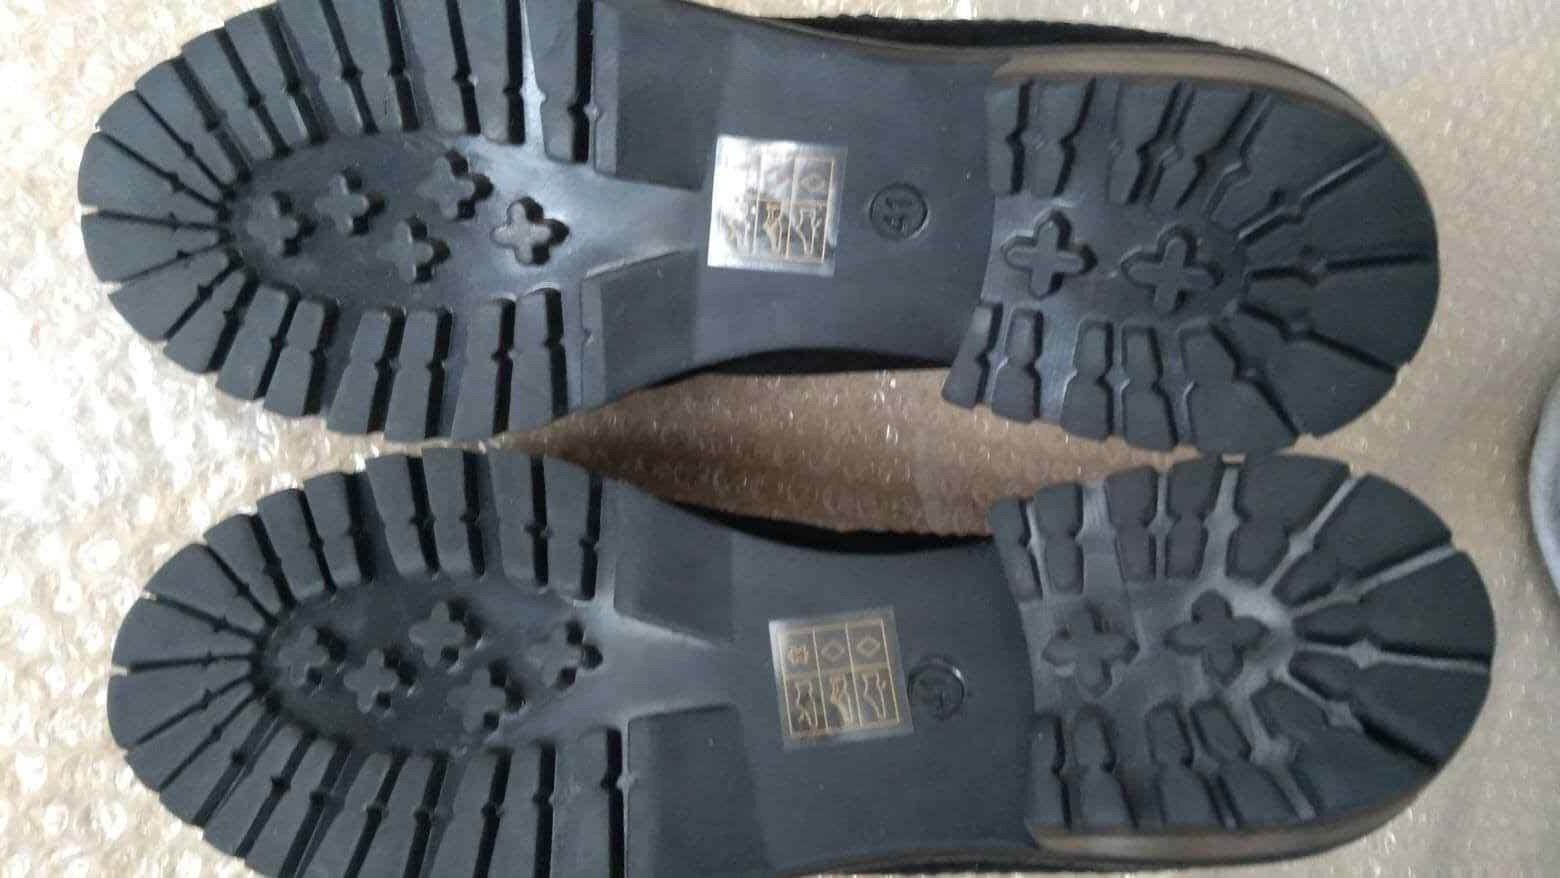 Armani Jeans ankle Damens's Stivaletto ankle Jeans Stiefel Größe 7.5UK(41EU) b1ad8b